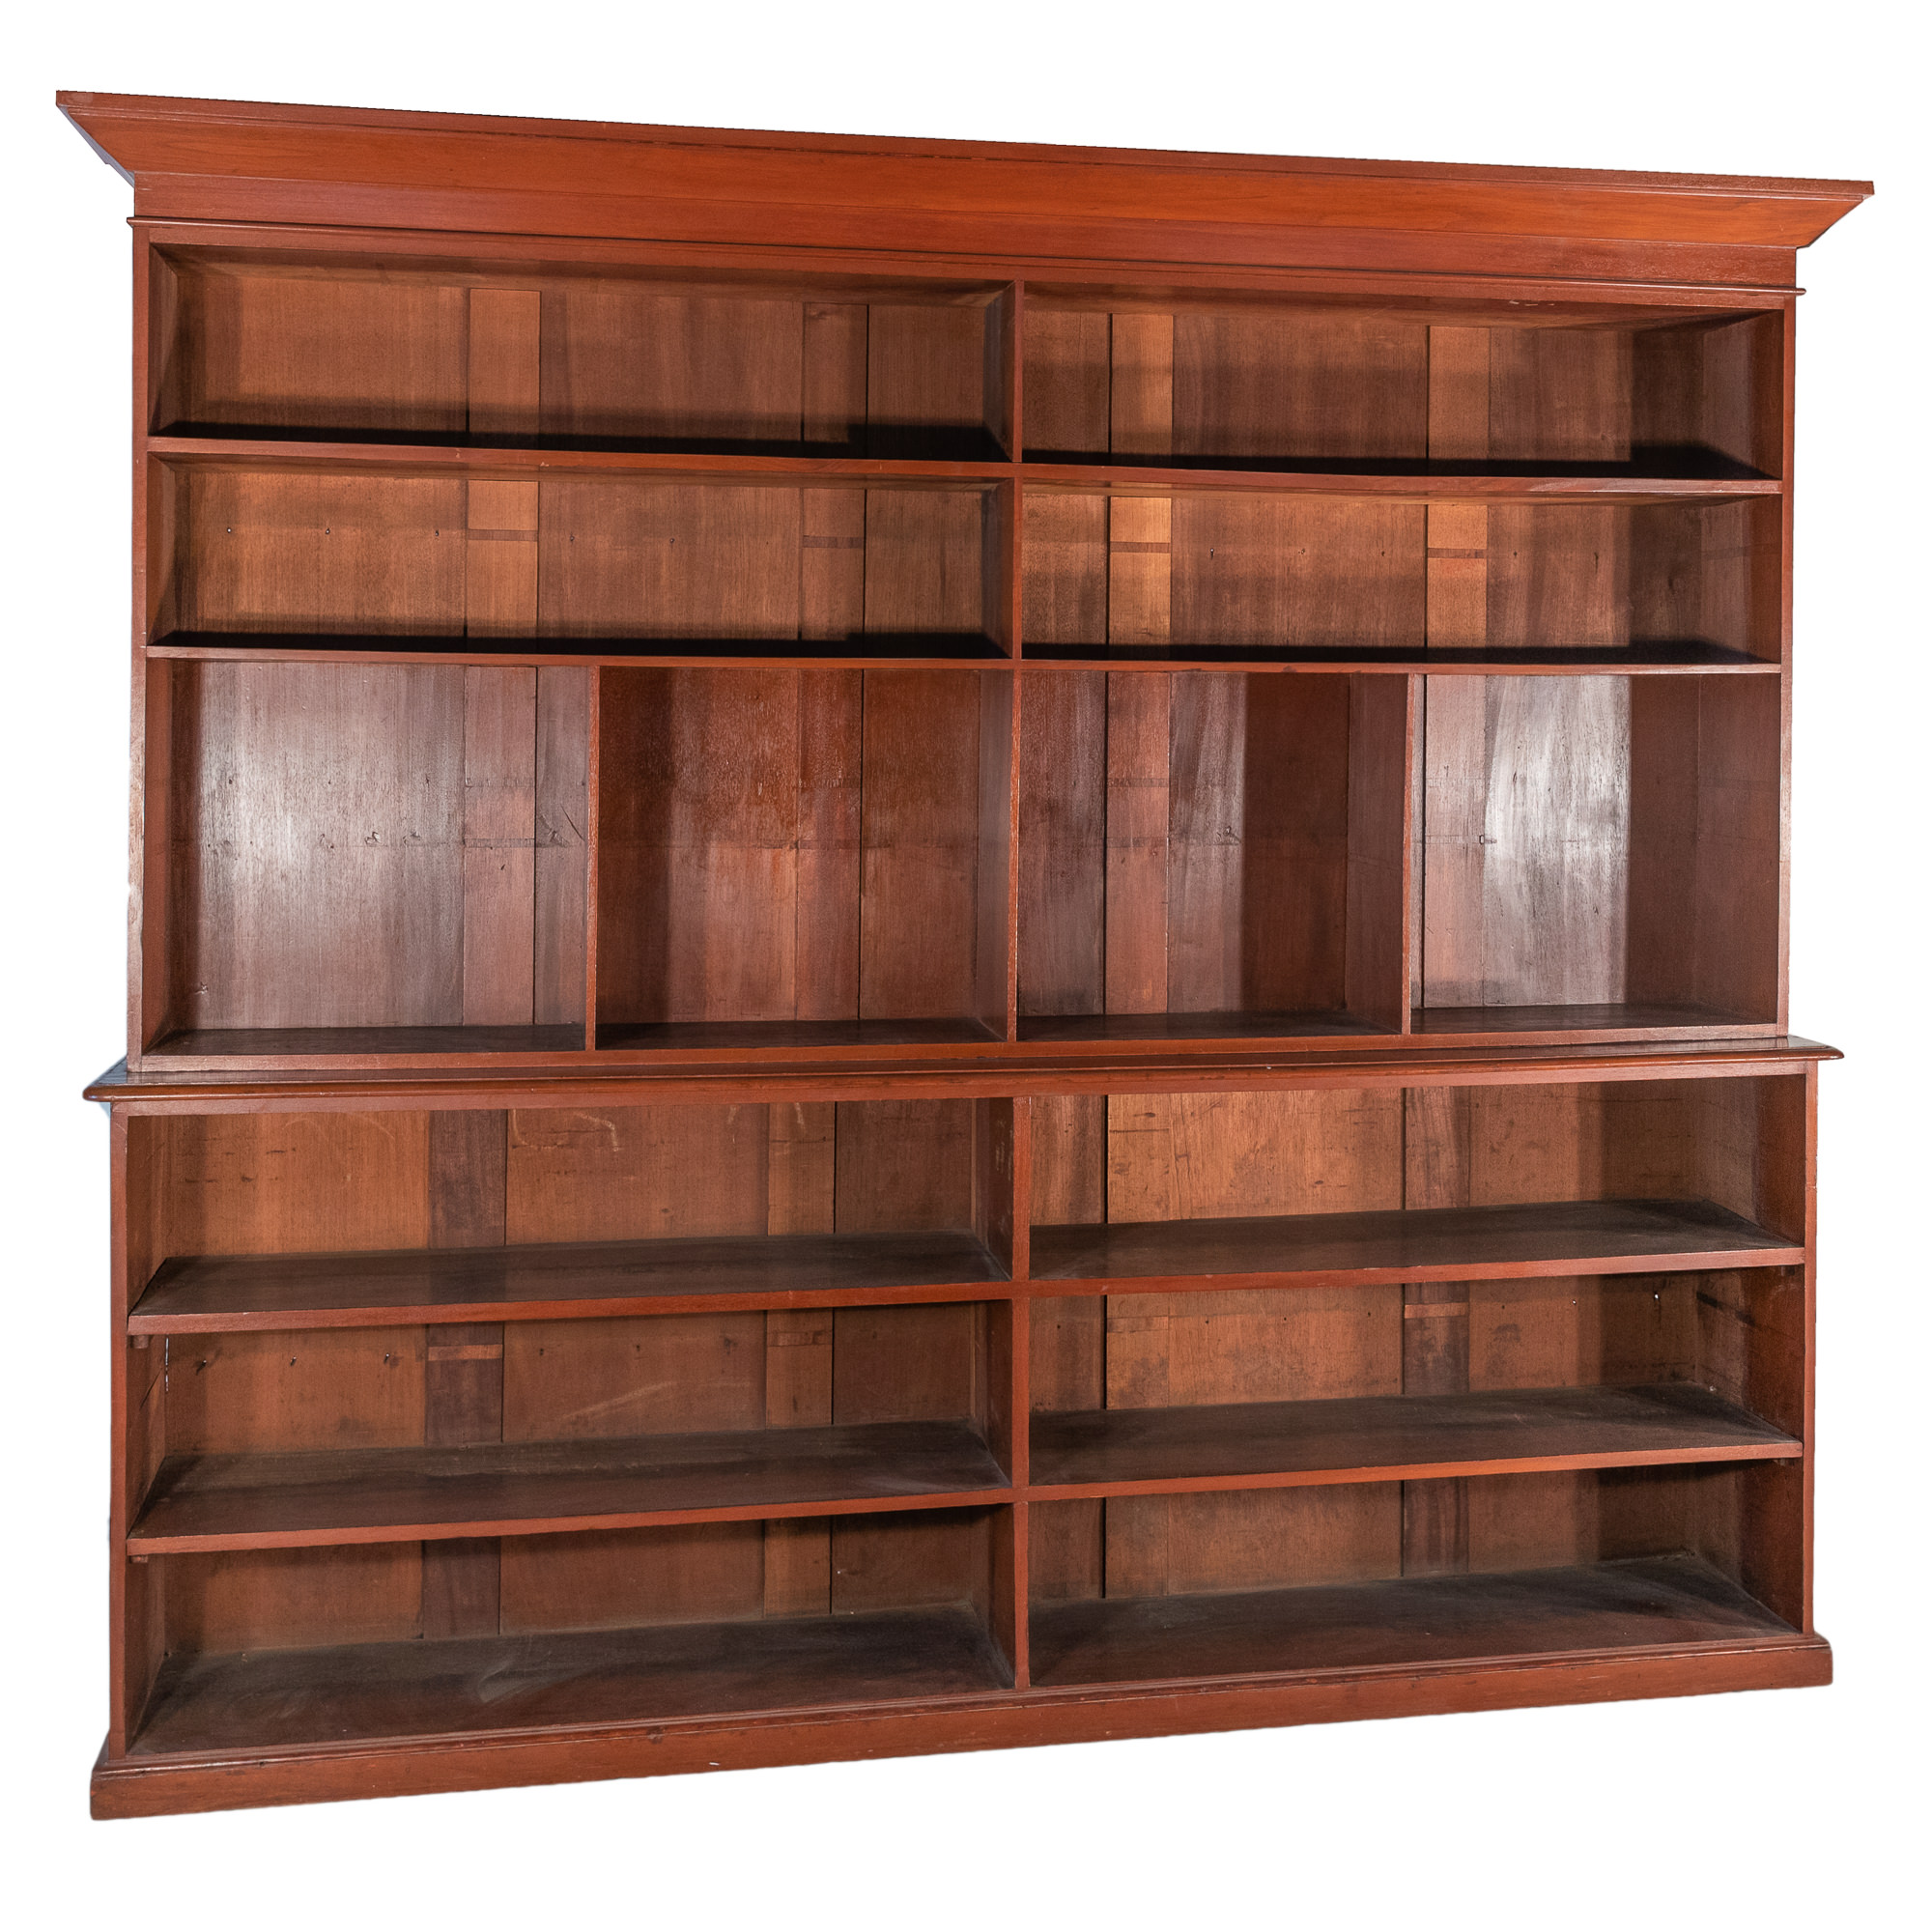 'Substantial Australian Red Cedar Open Bookcase 19th Century'